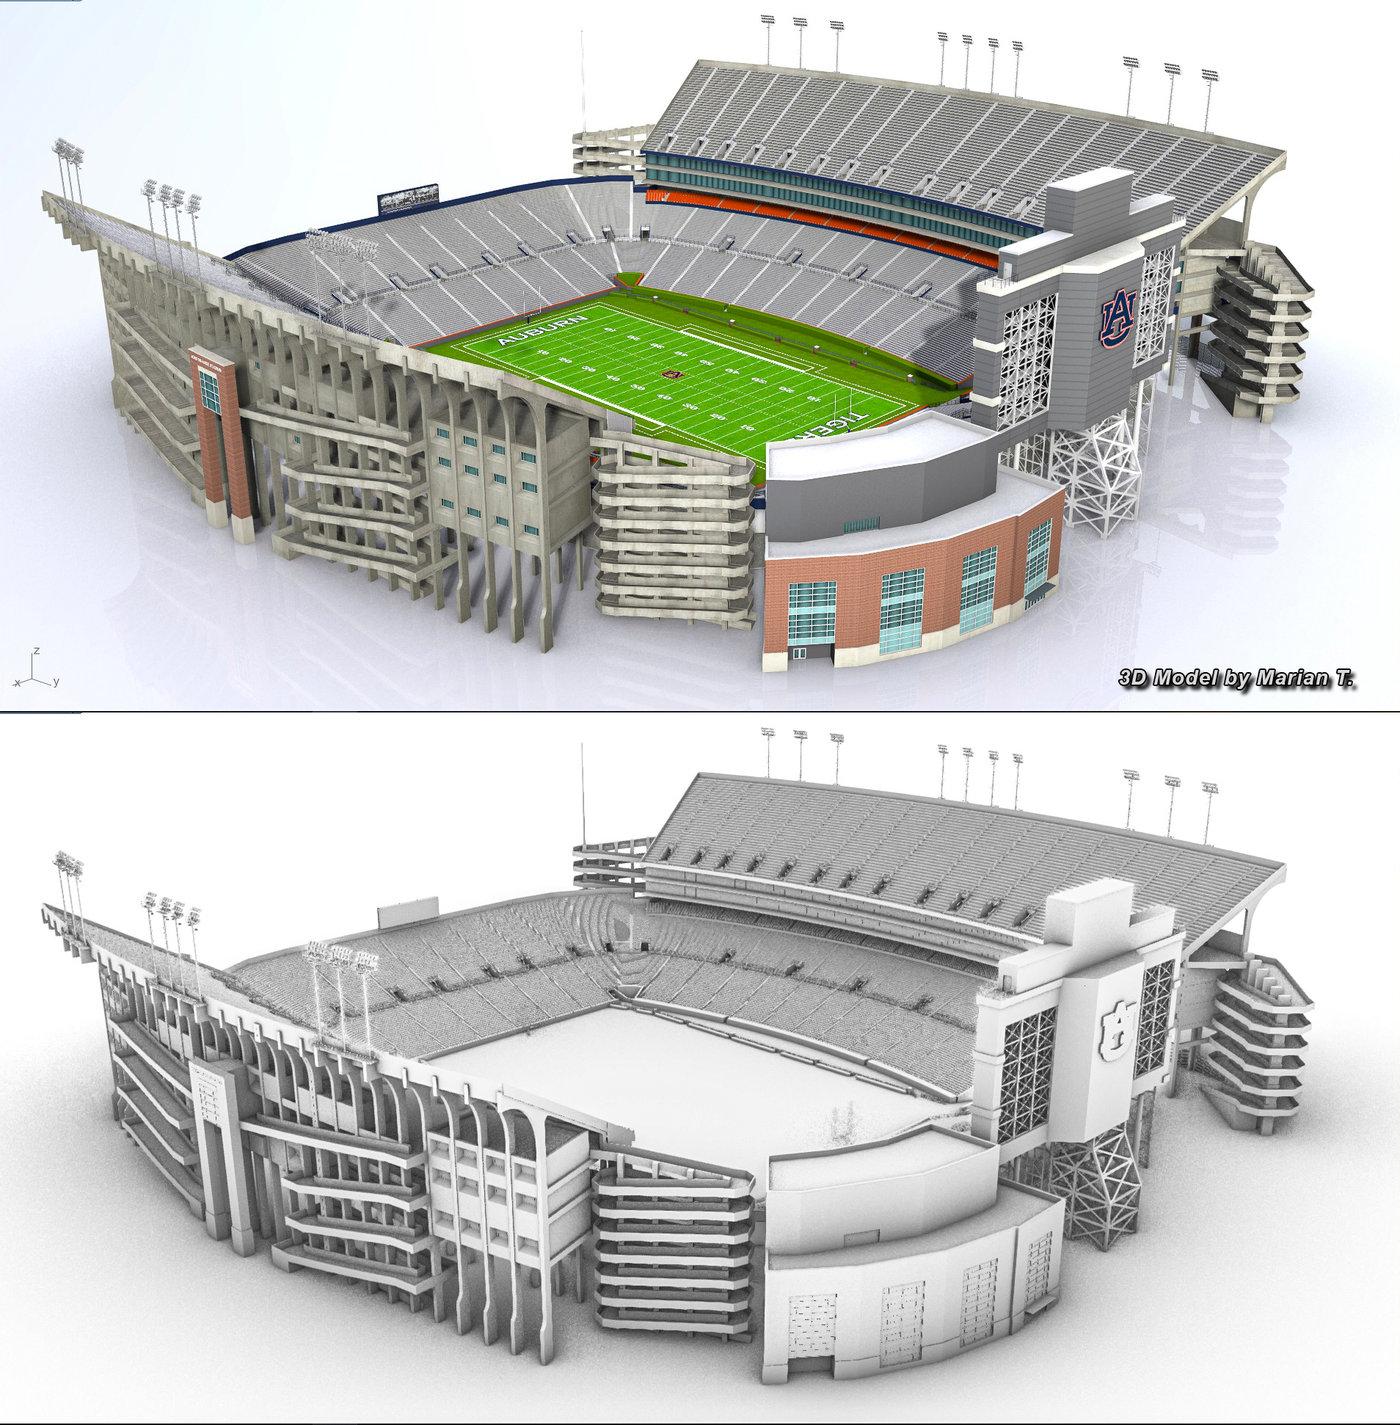 Jordan-Hare stadium 3D